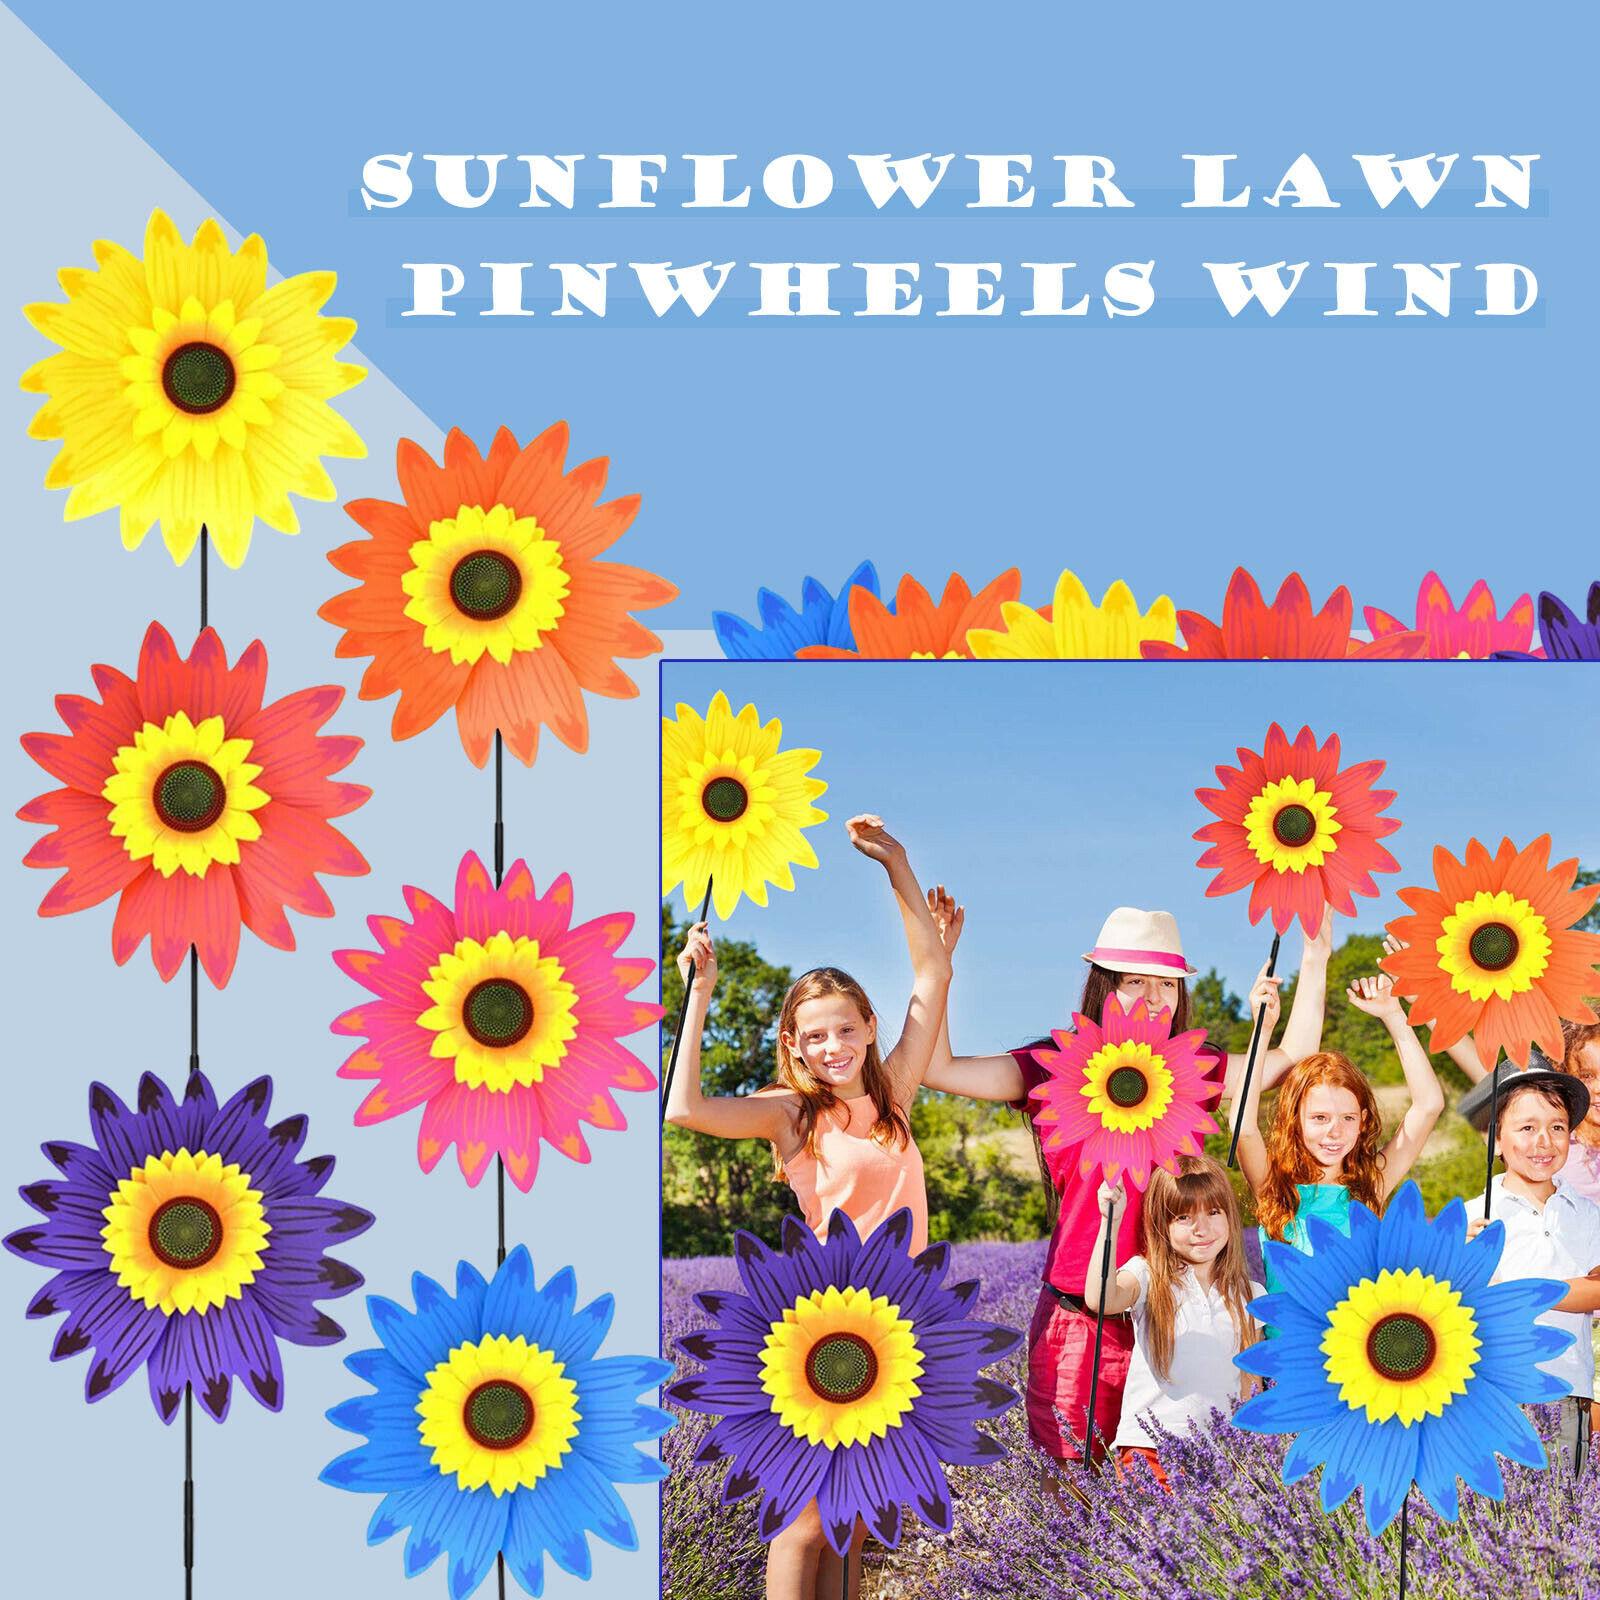 Sunflower Lawn Wind Garden Party Wind Garden Lawn Windmill Decoration Outdoor De